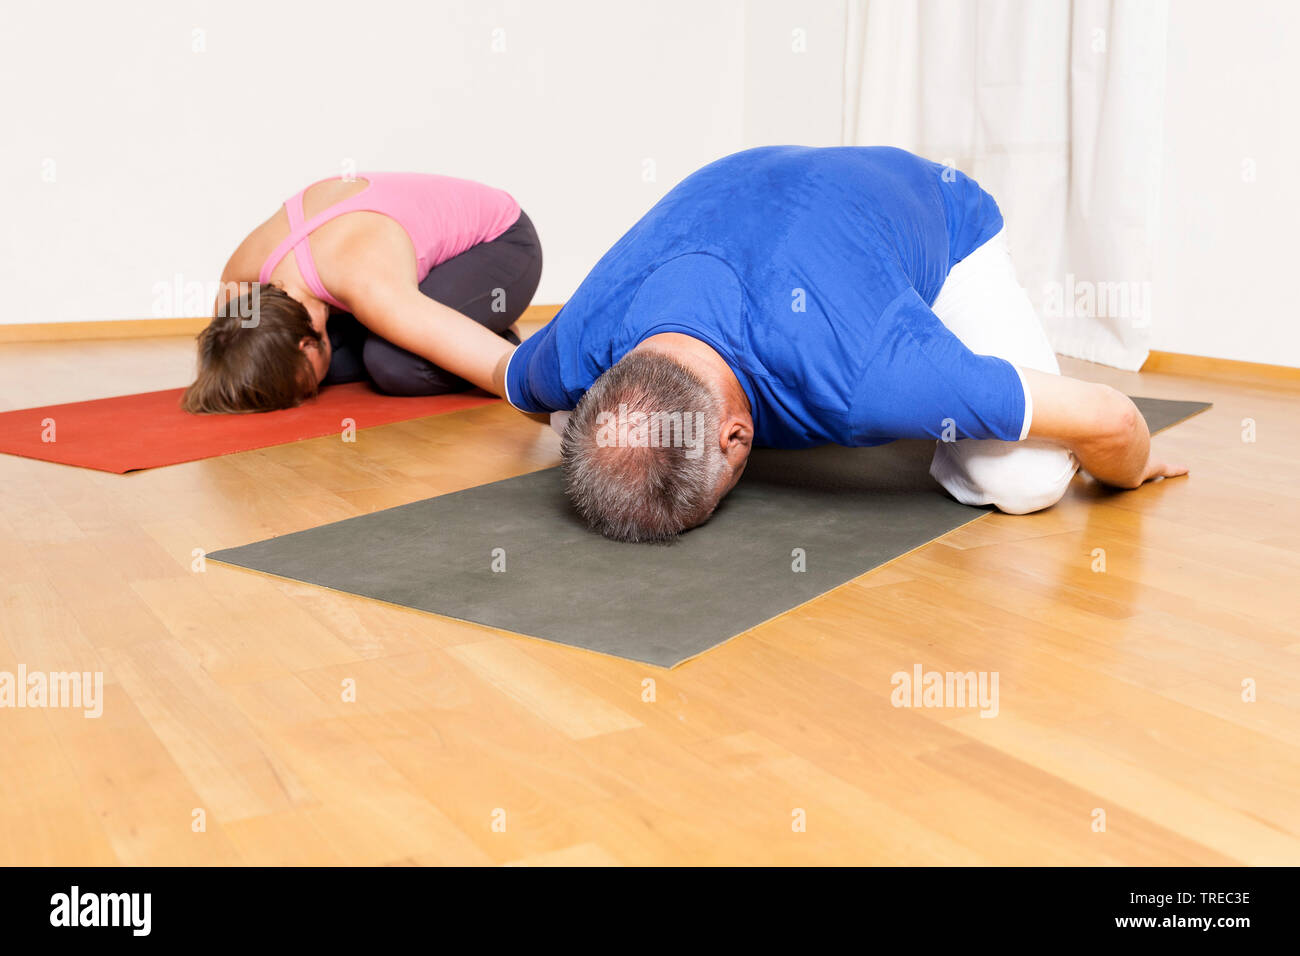 Frau und Mann machen Yoga-Uebungen, Europa | woman and man doing yoga, Europe | BLWS522592.jpg [ (c) blickwinkel/McPHOTO/M. Gann Tel. +49 (0)2302-2793 - Stock Image